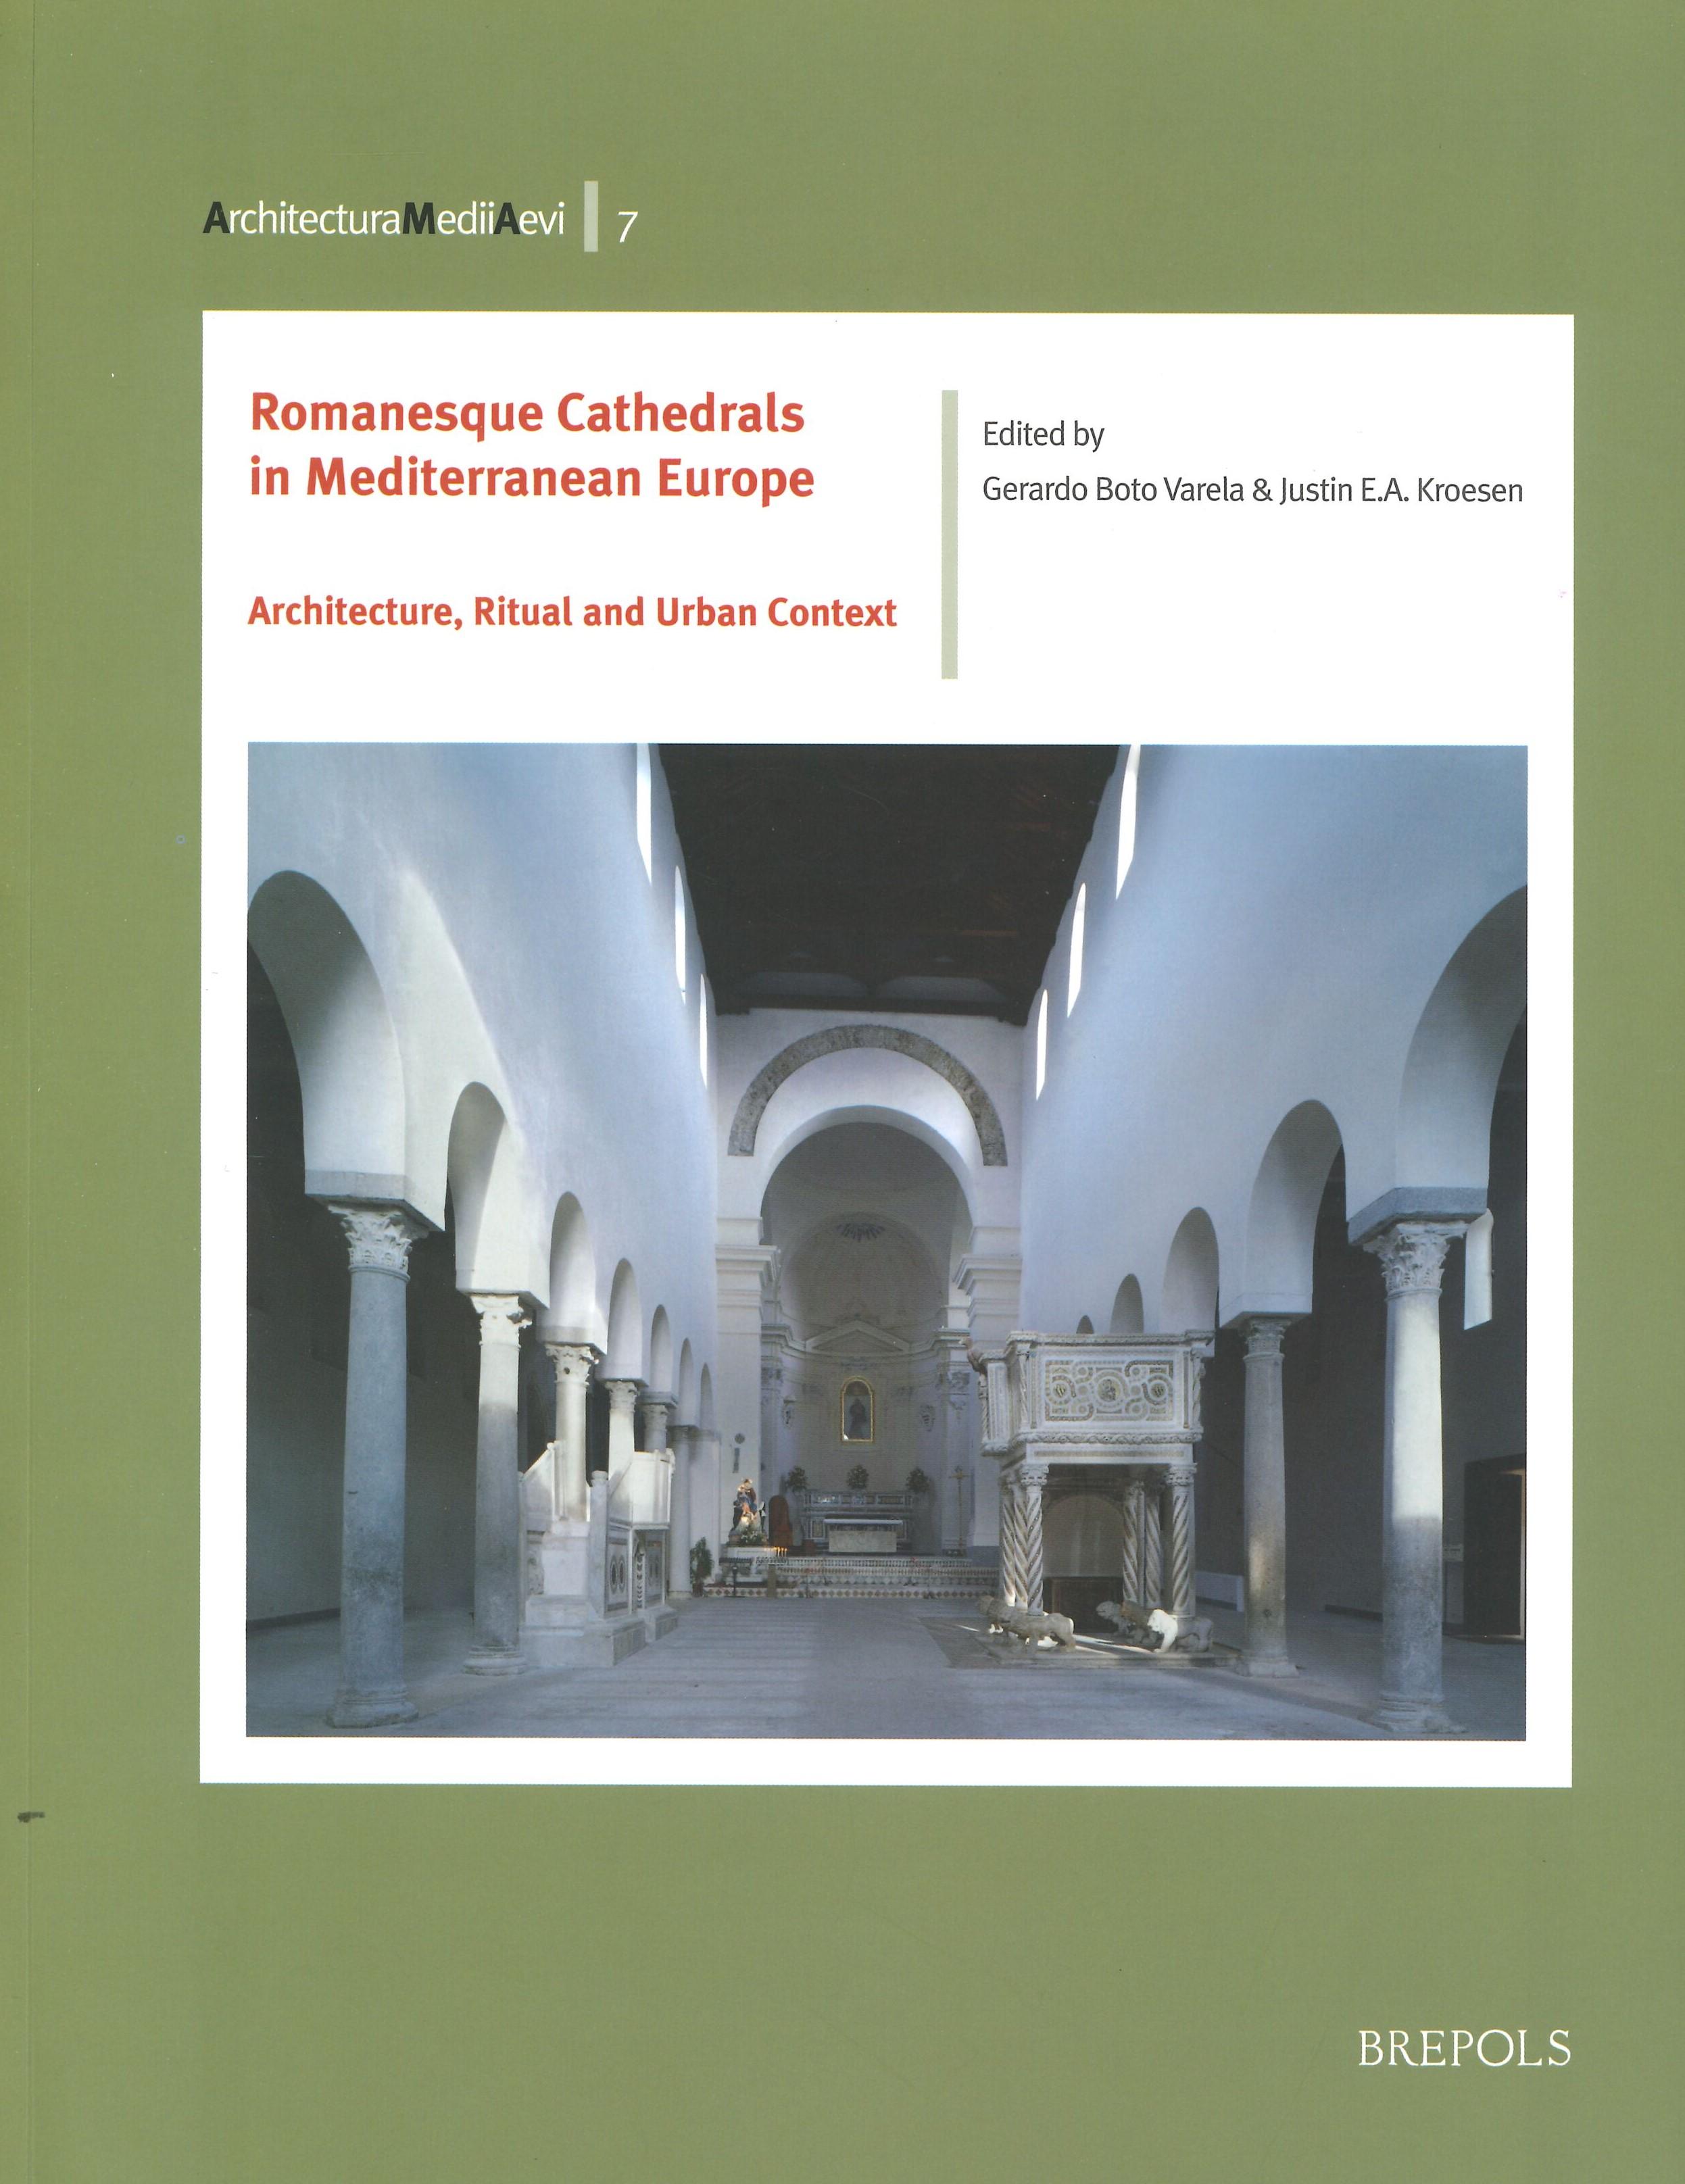 romanesque_cathedrals.jpg